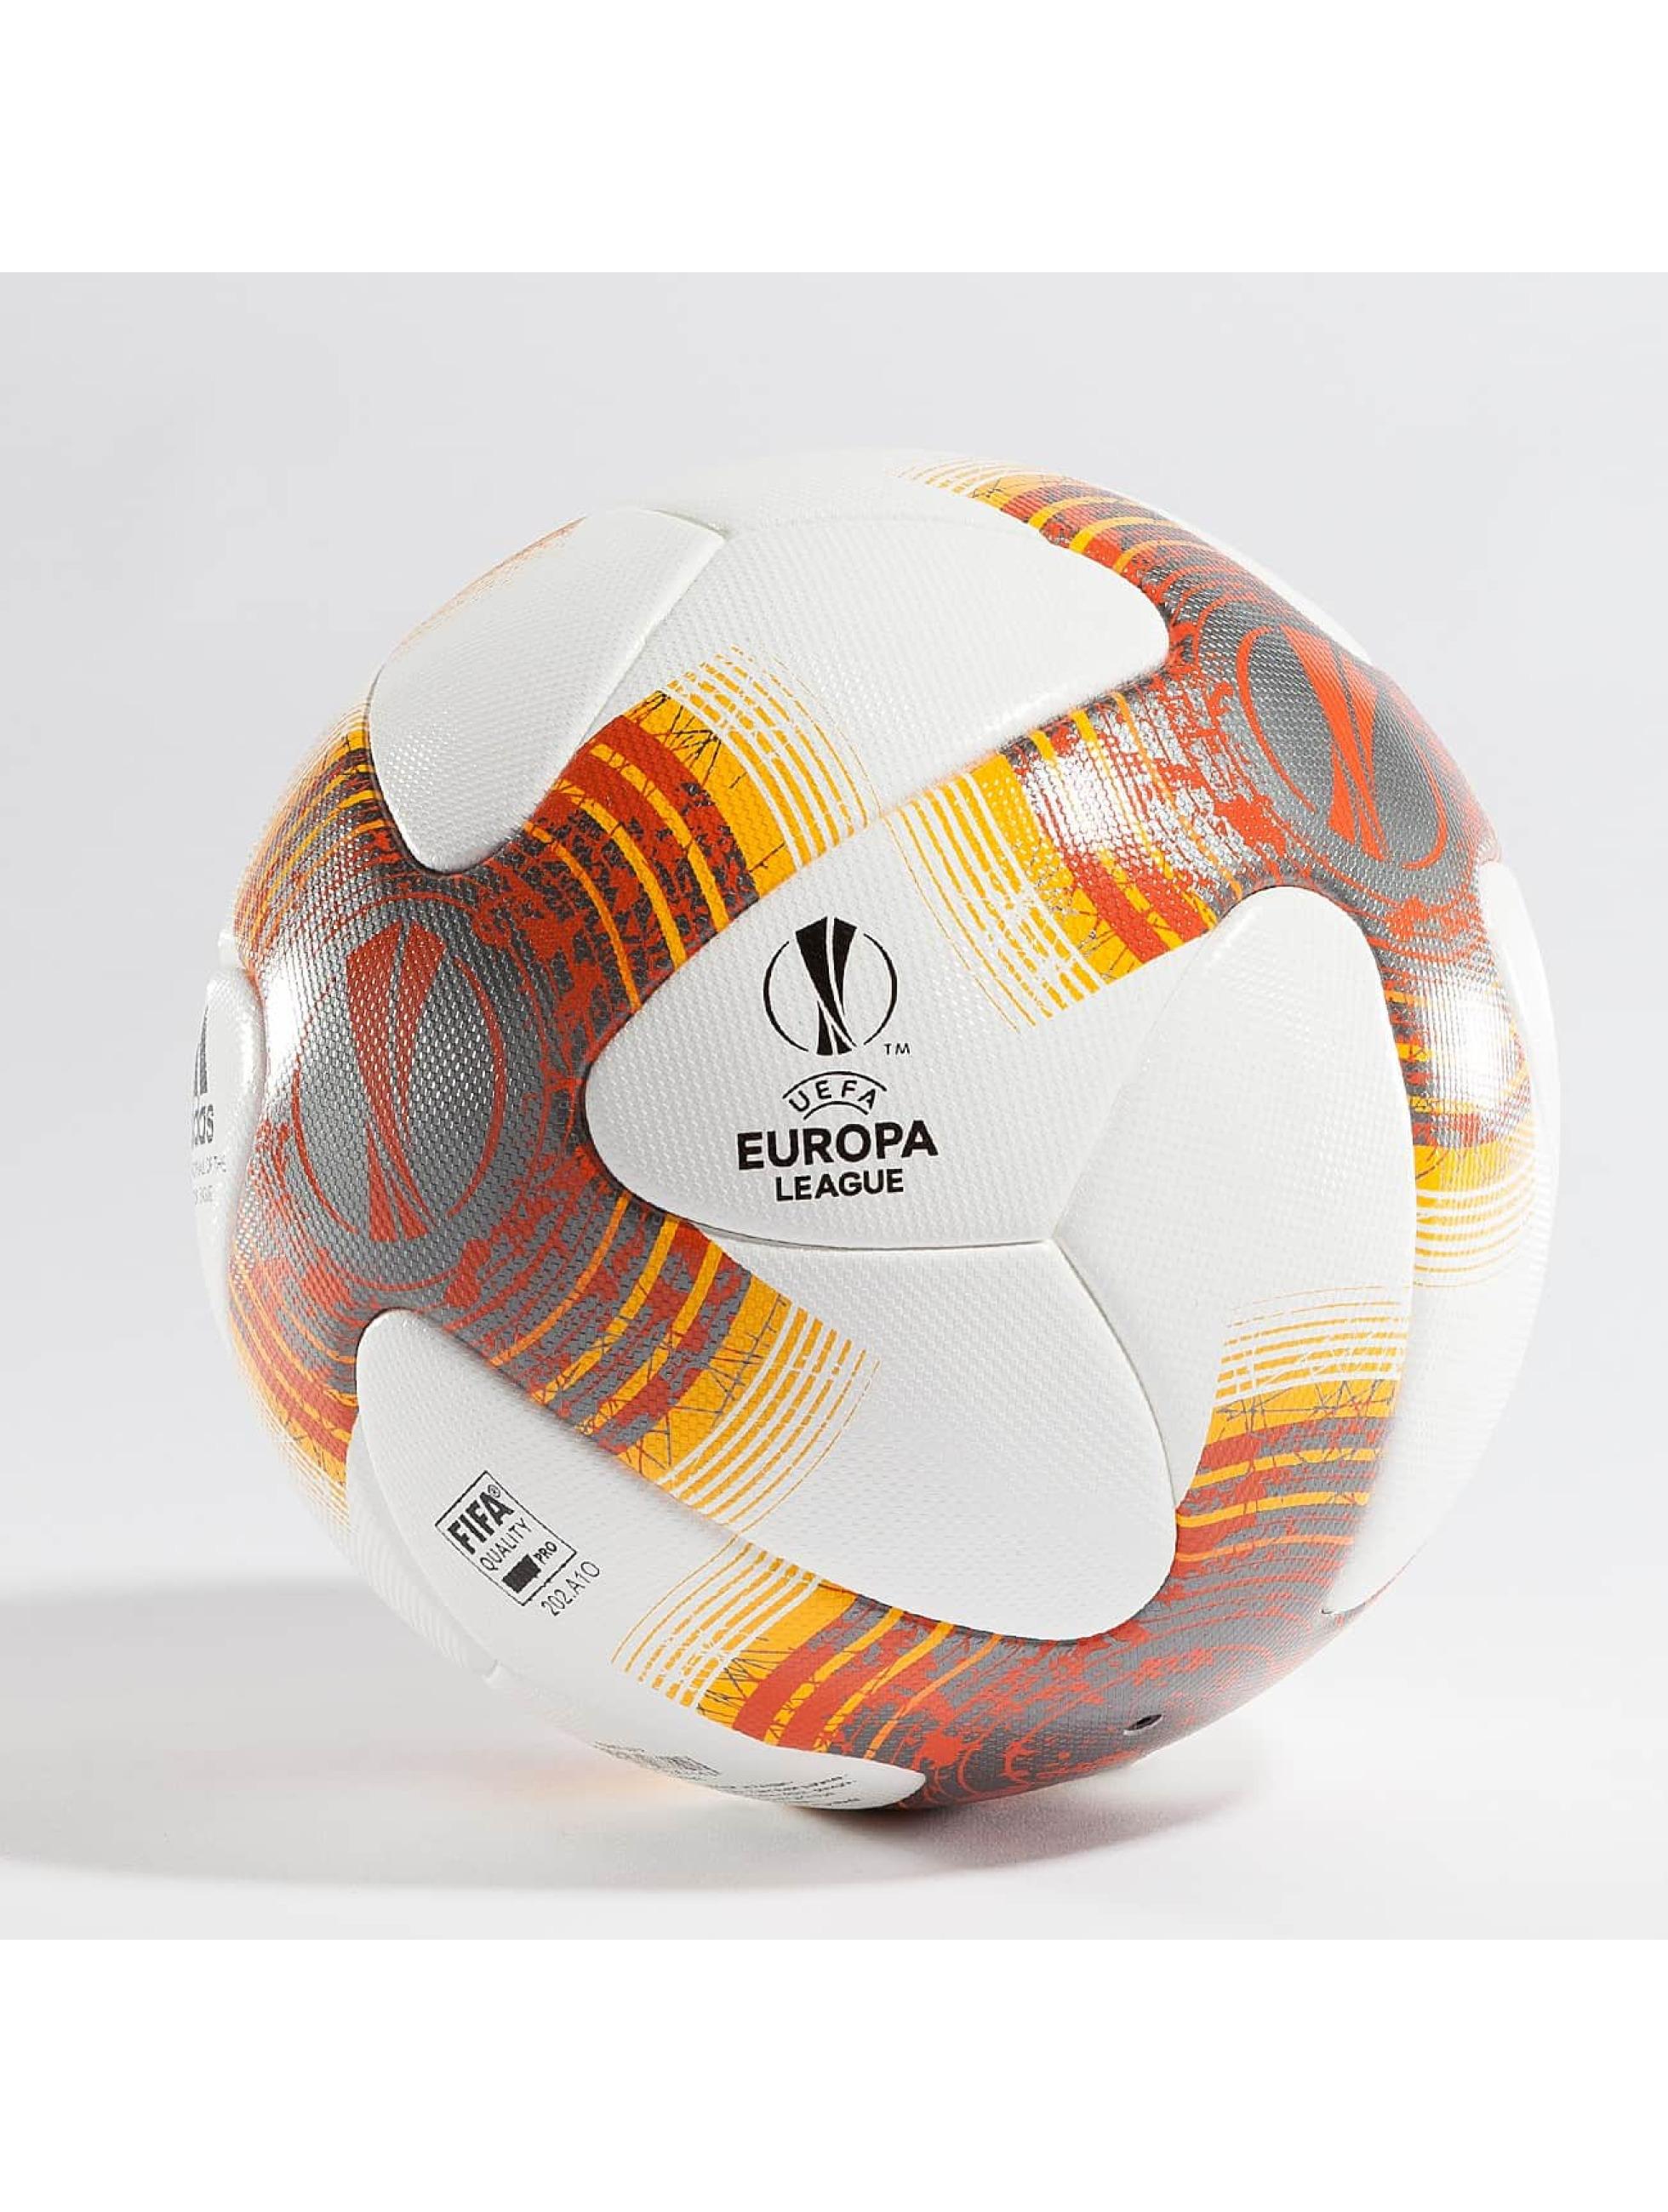 Adidas Performance Мяч Uefa Europa League Offical Match Ball белый